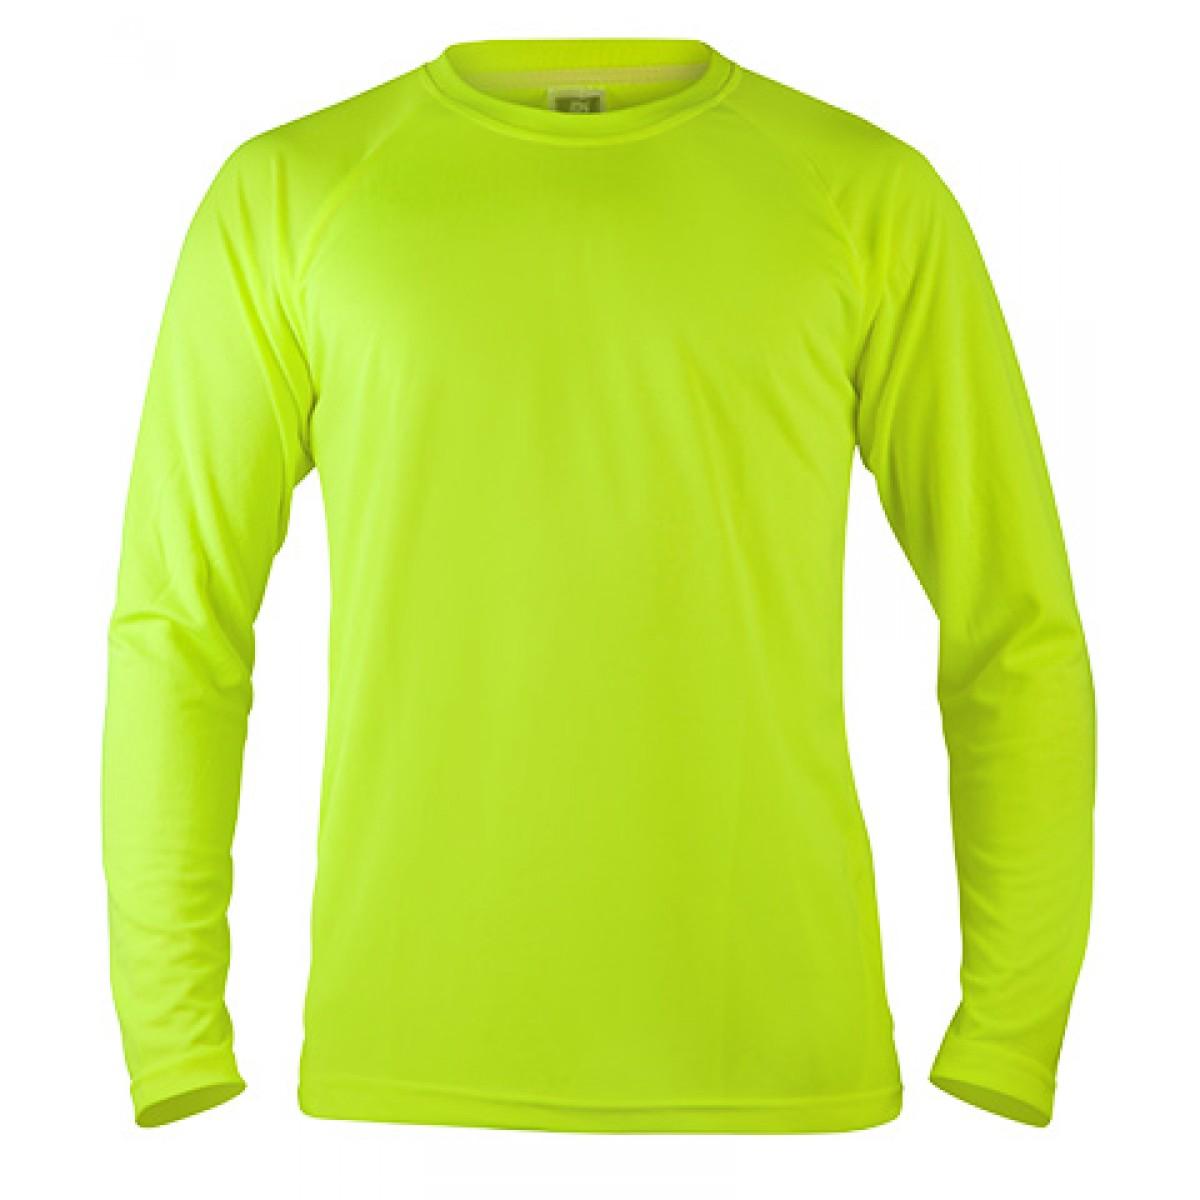 Long Sleeve Mesh Performance T-shirt-Neon Green-XL